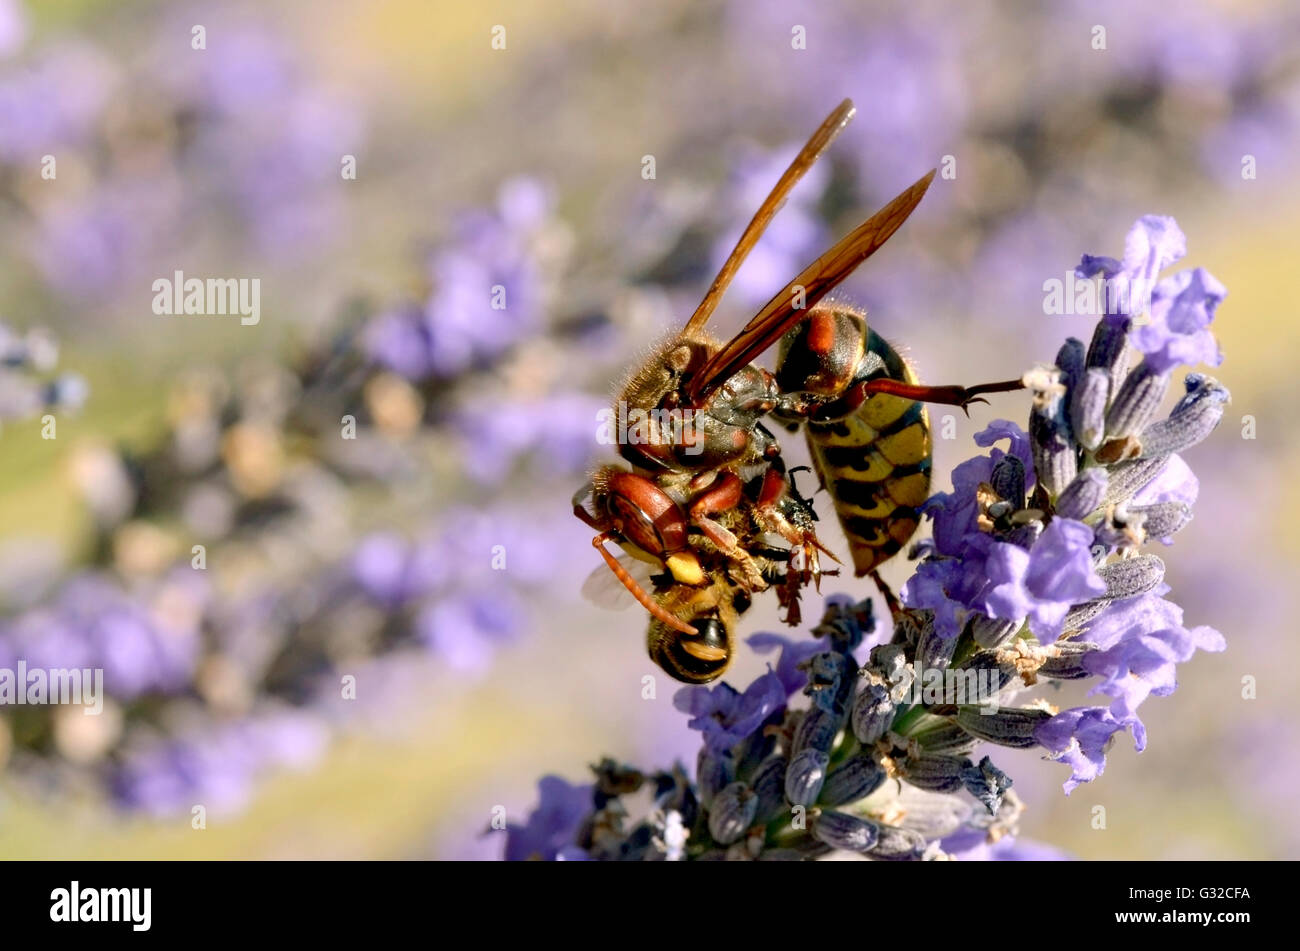 Macro of European hornet (Vespa crabro) eating a honey bee on lavender flower - Stock Image